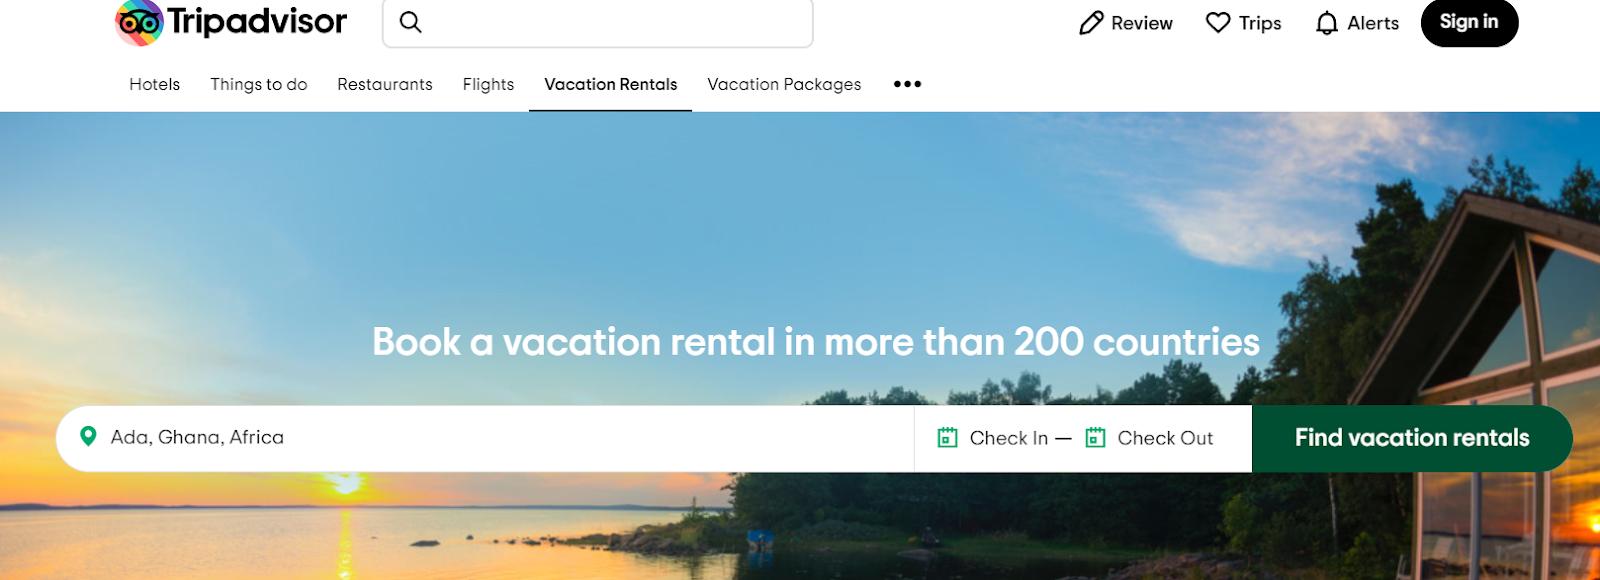 Screenshot of TripAdvisor - Travel Search Engine